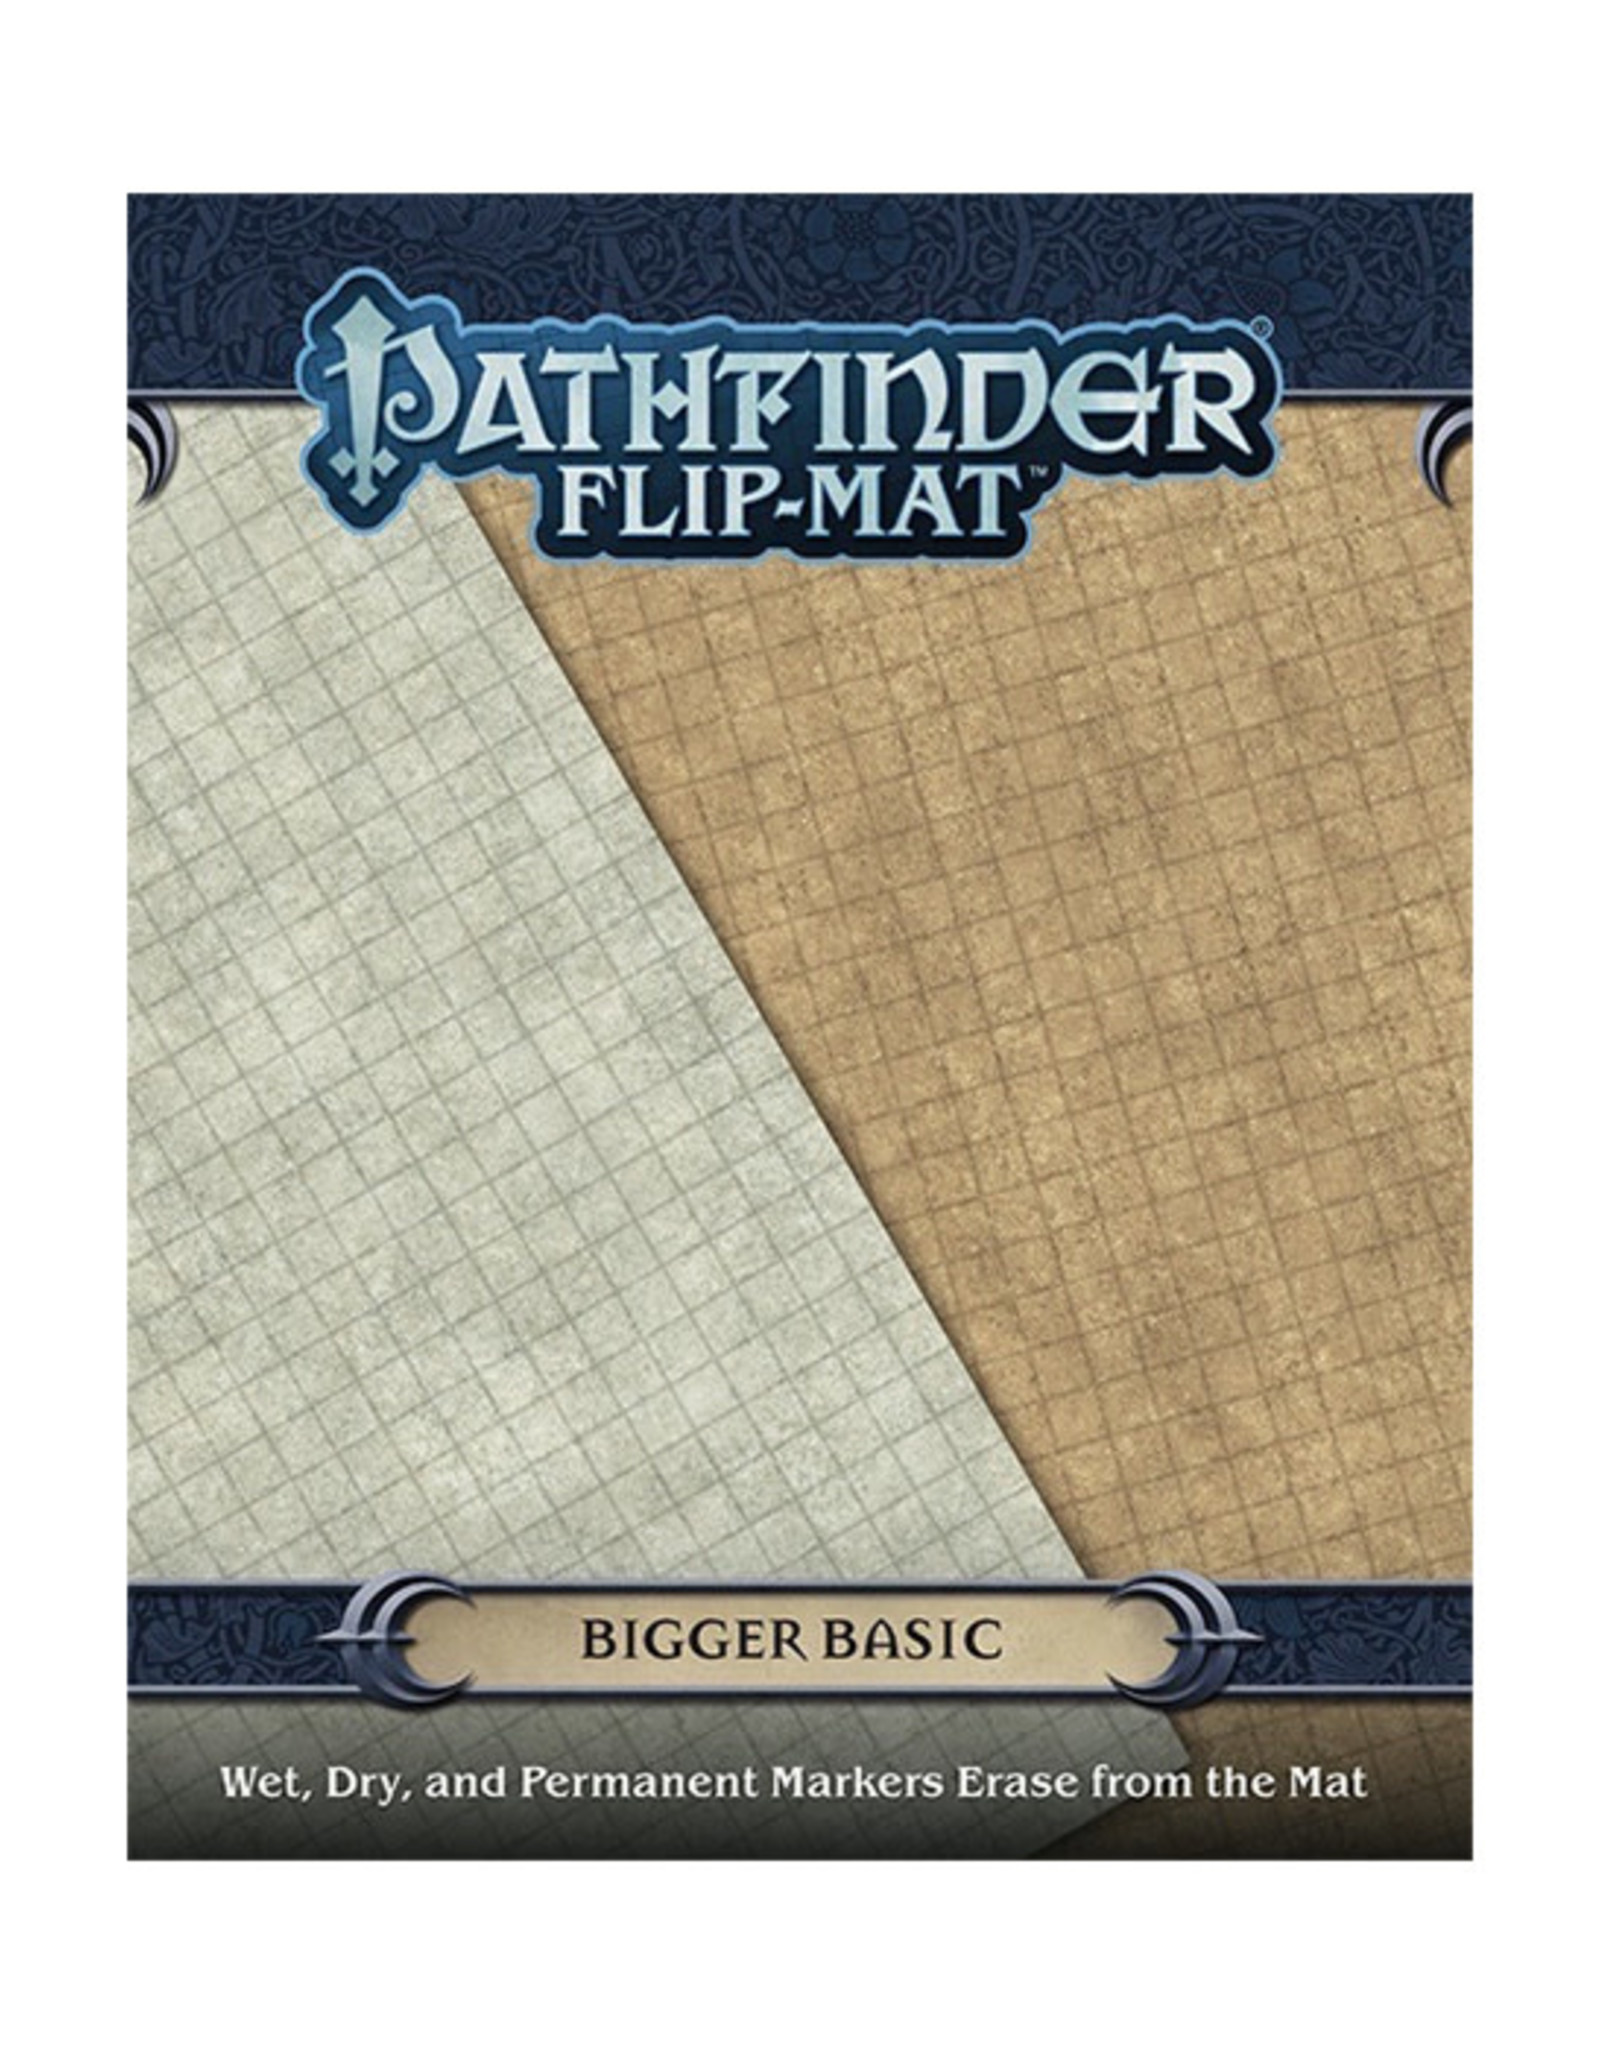 Pathfinder Pathfinder: Flip-Mat - Bigger Basic